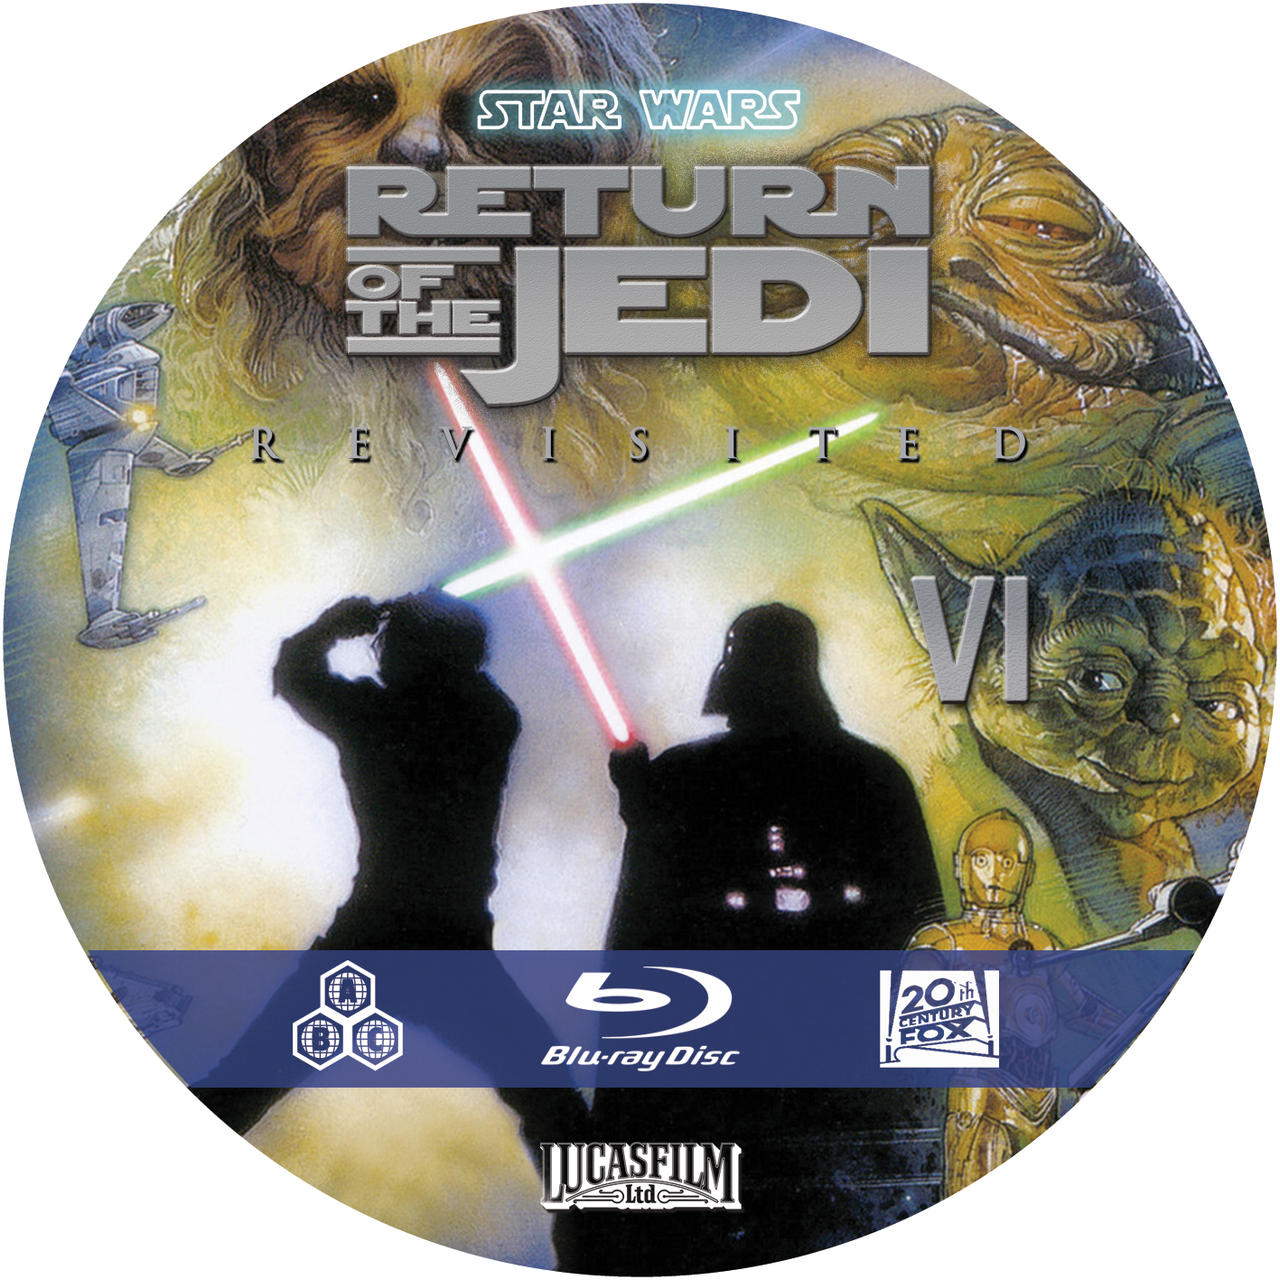 Star Wars Revisited Return of the Jedi custom blu ray disc